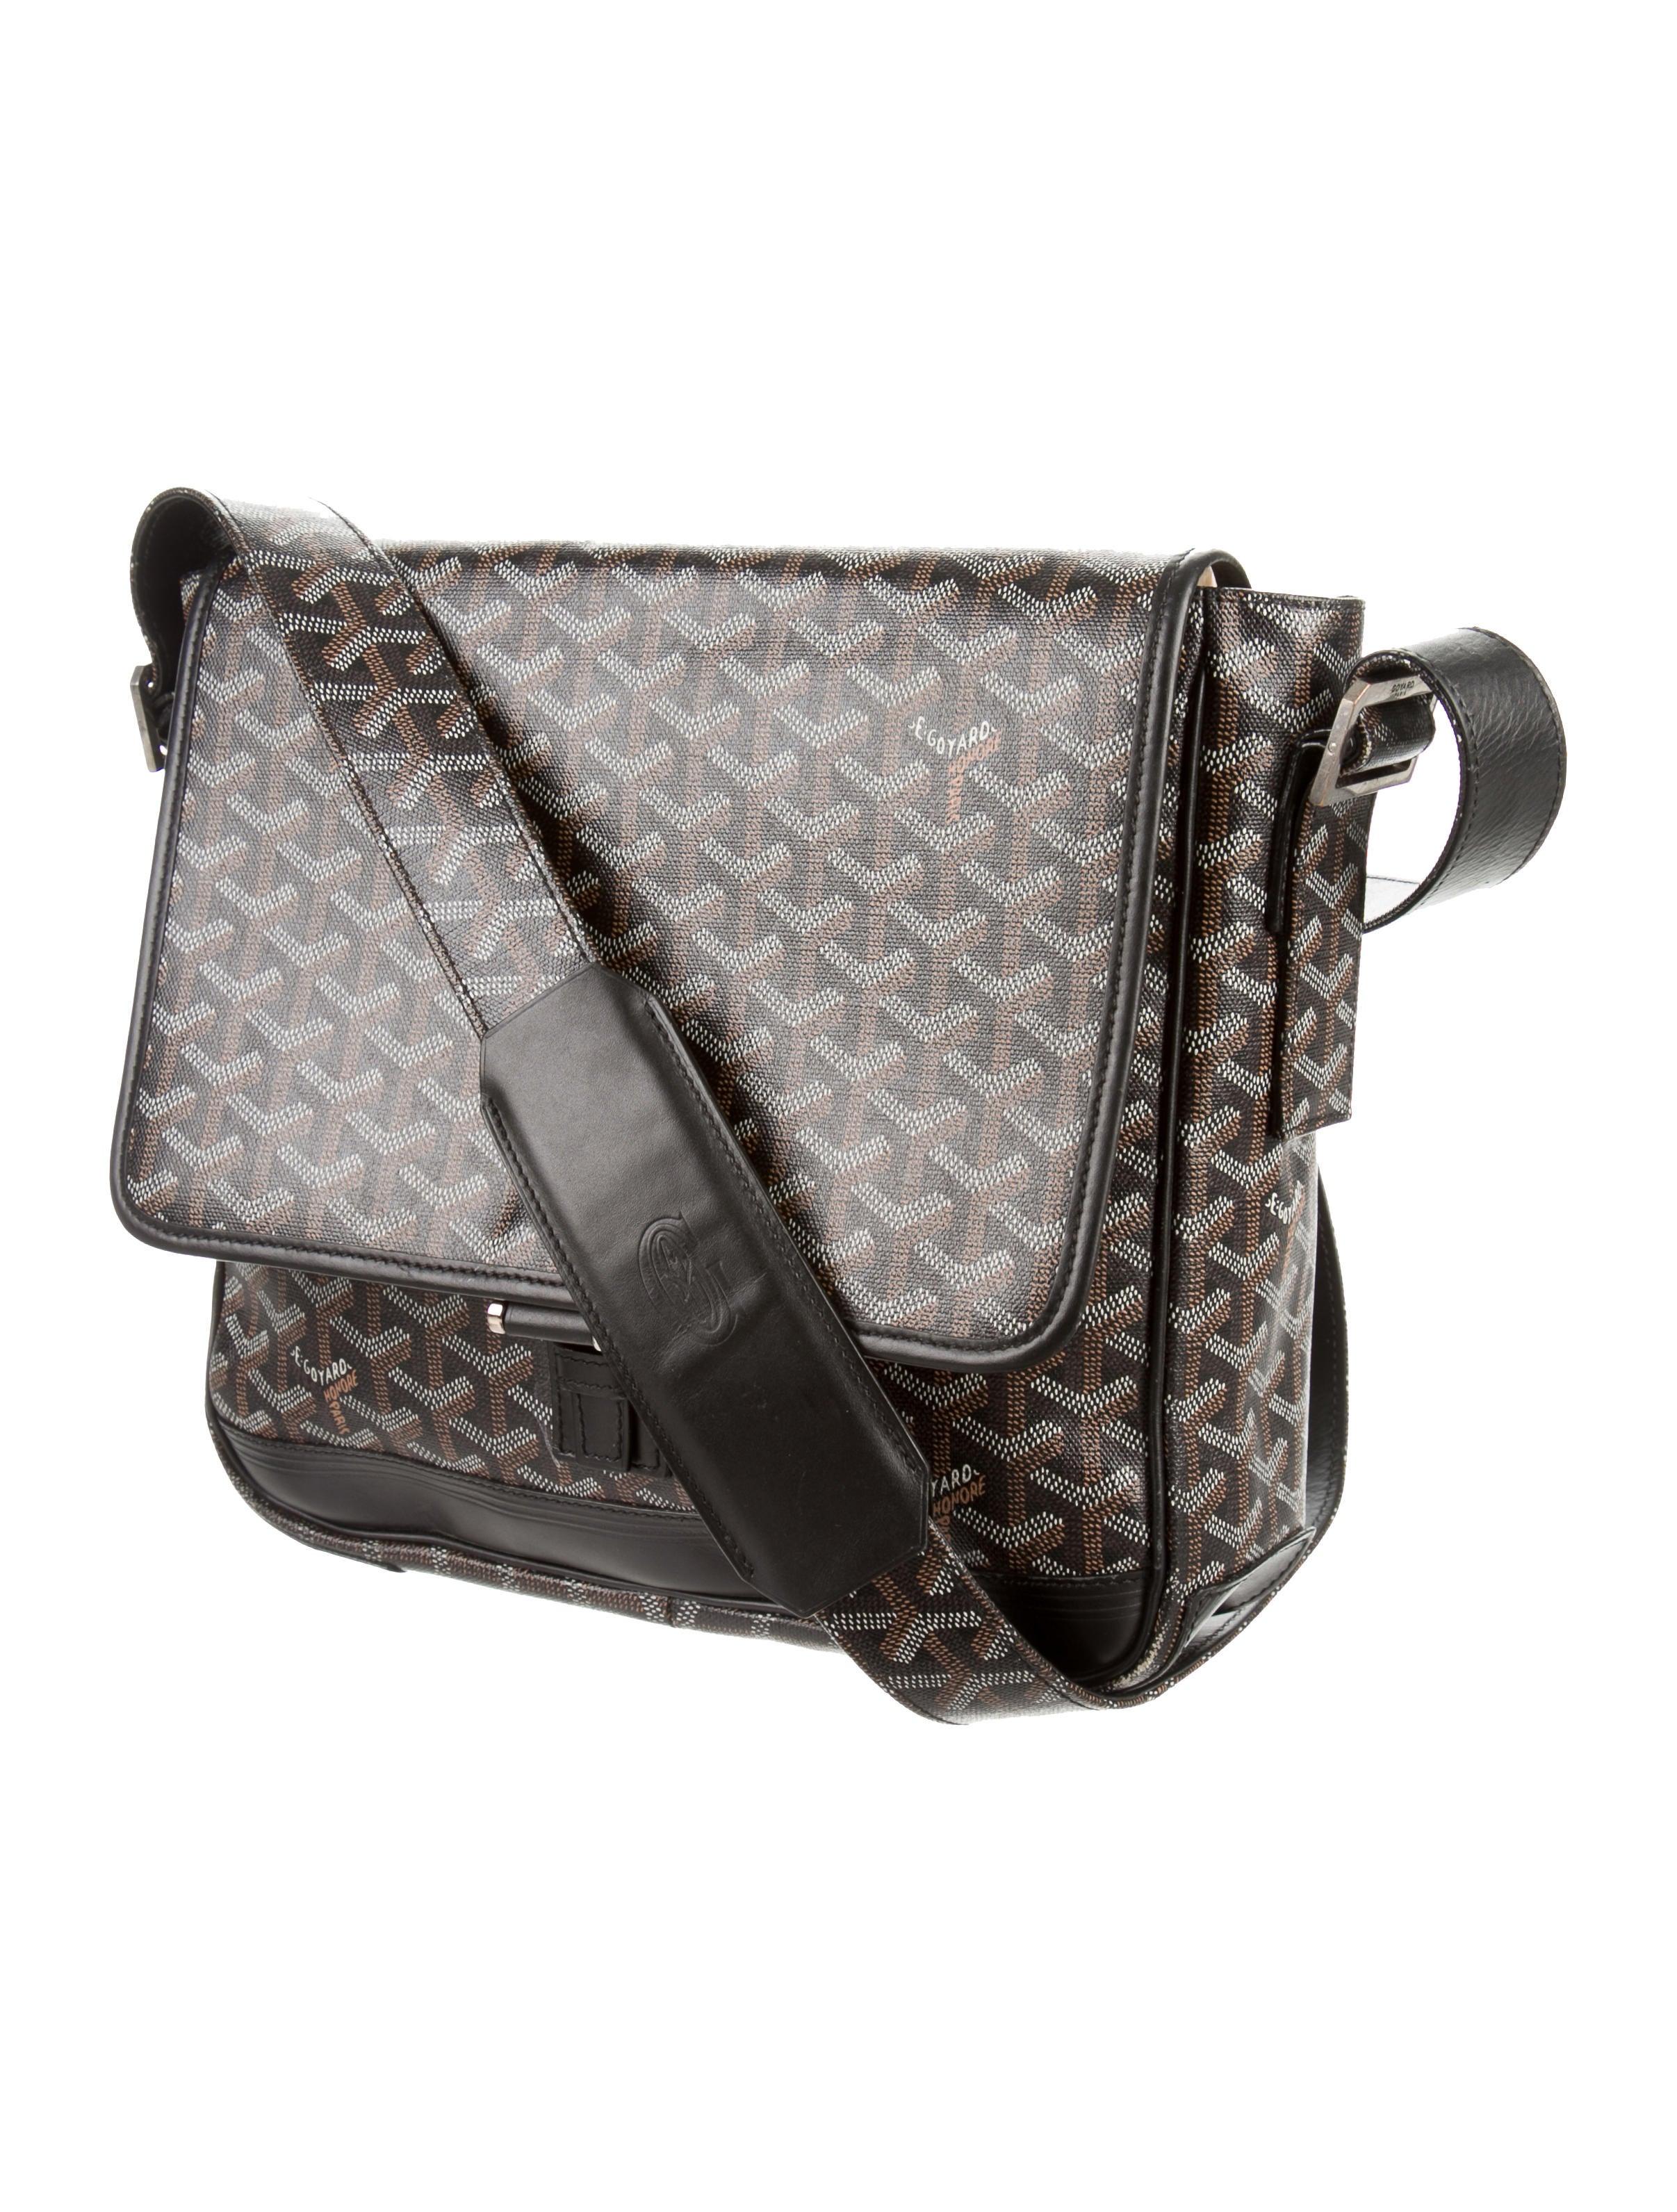 aee56d4e3e Goyard Small Urbain Messenger Bag Price   Stanford Center for ...